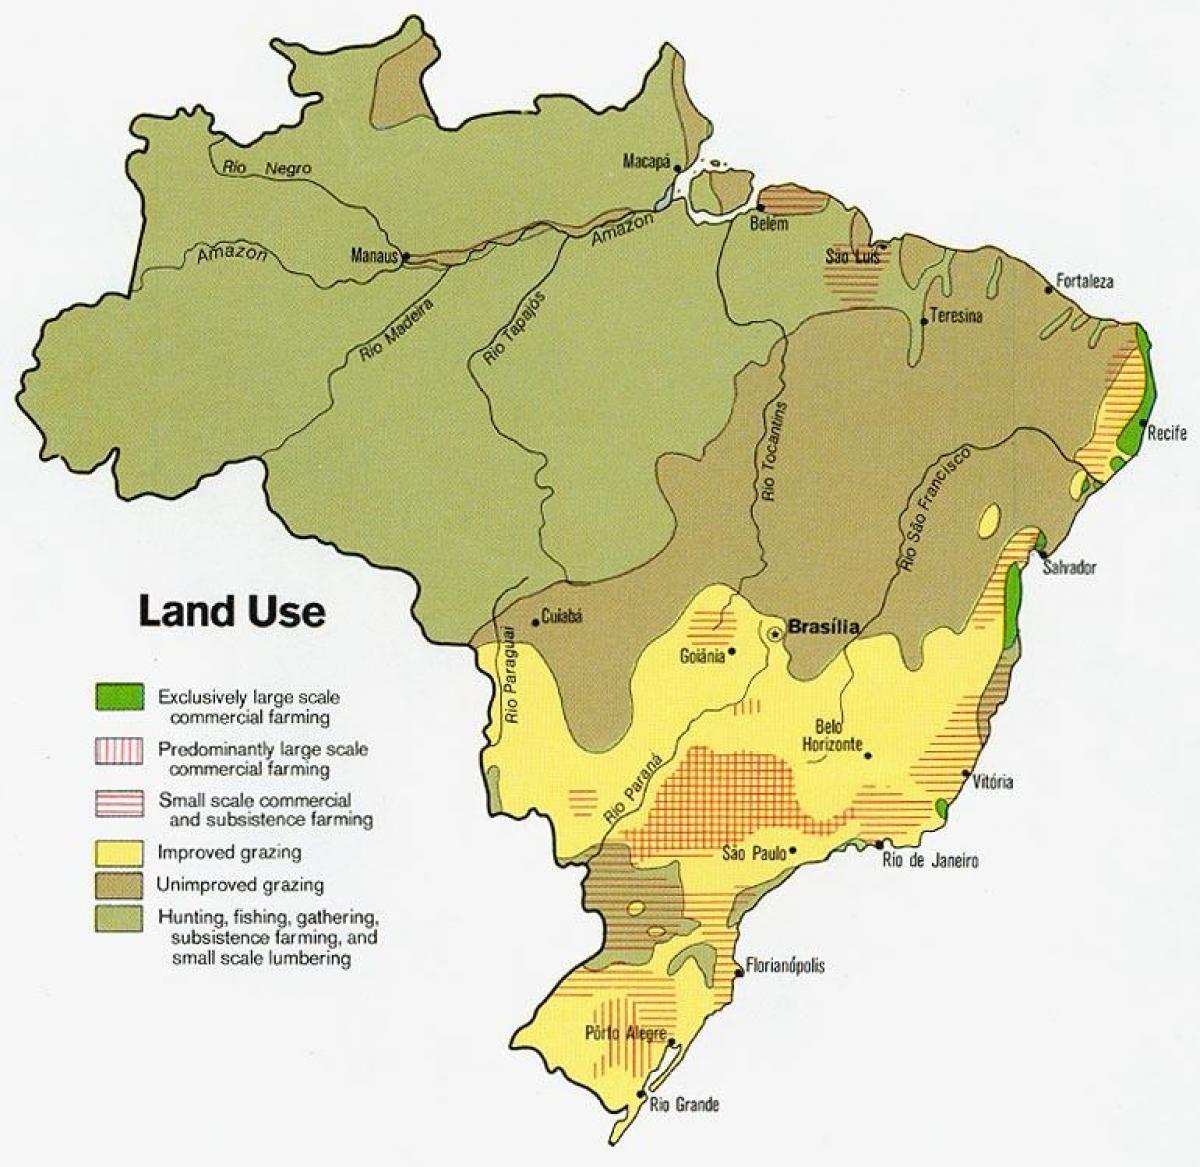 Carte Du Bresil Agriculture.Le Bresil L Agriculture Map Carte Du Bresil De L